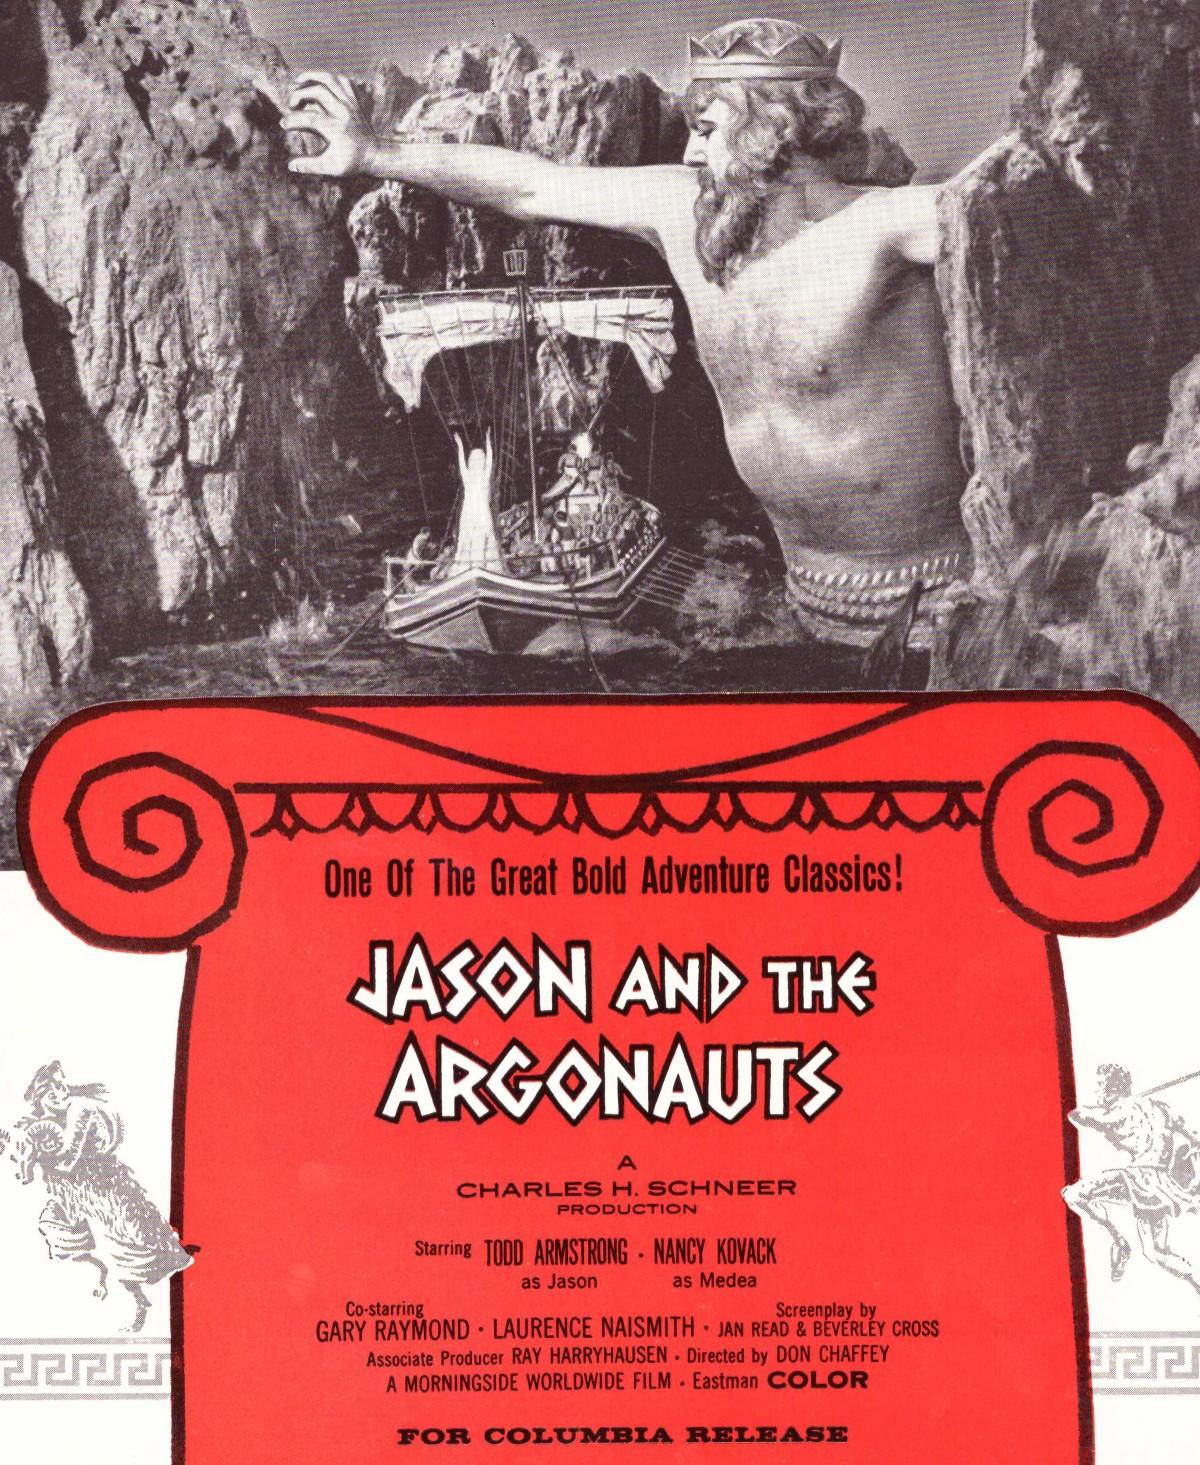 Jason and the Argonauts (1963)*****